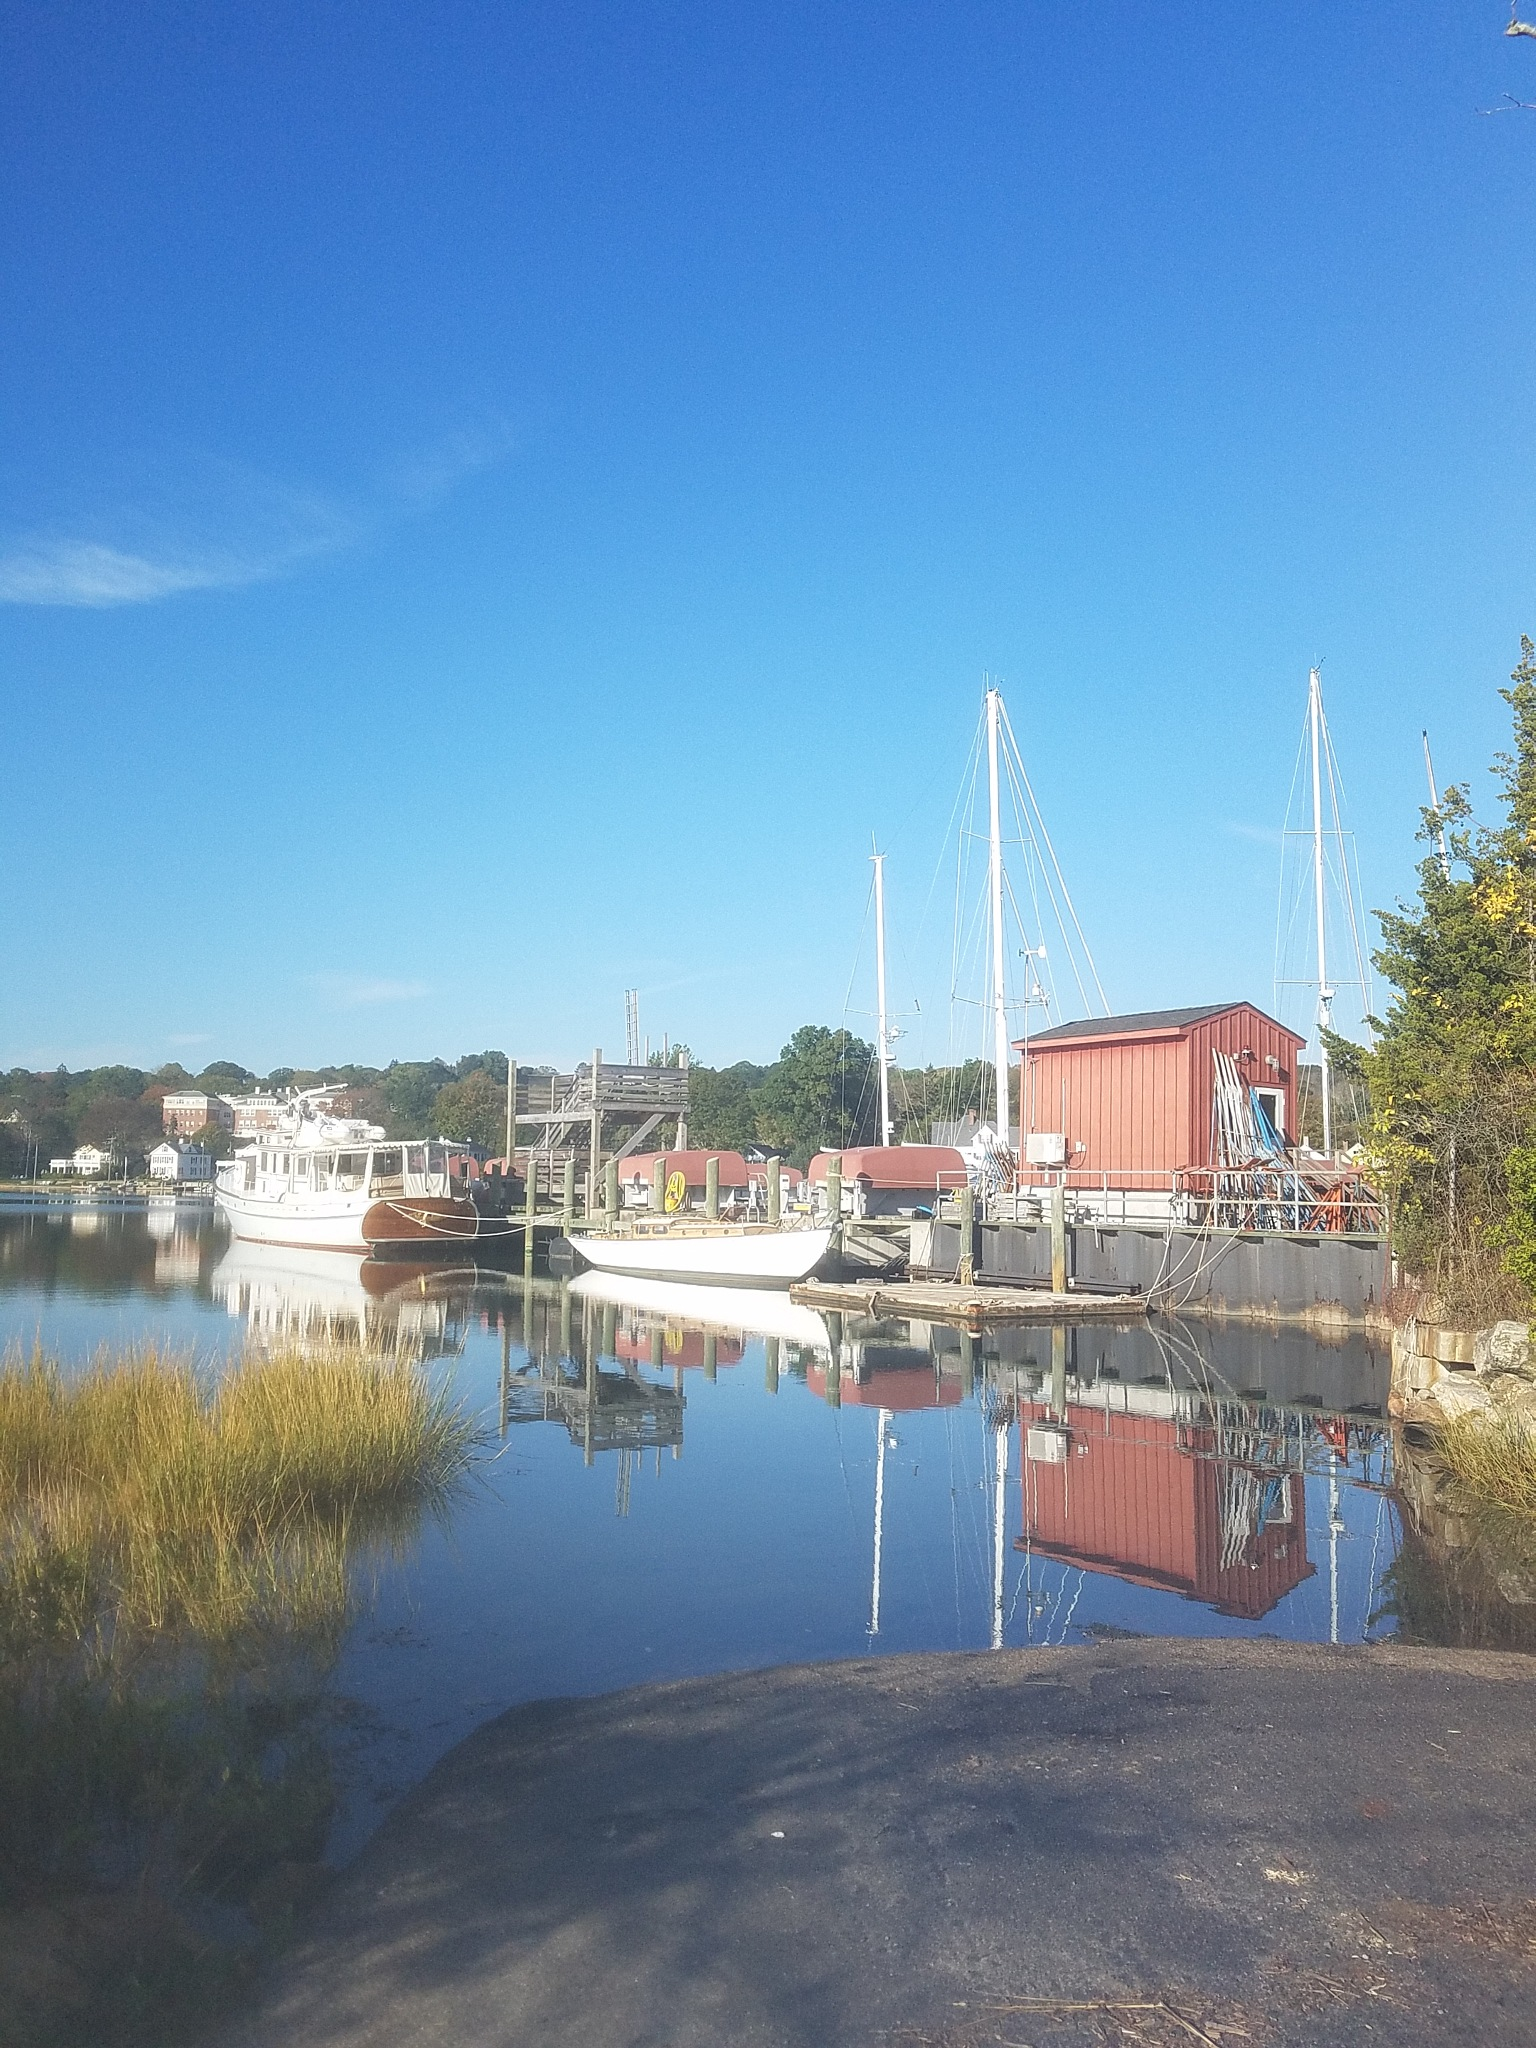 quaint New England by Dru Coleman